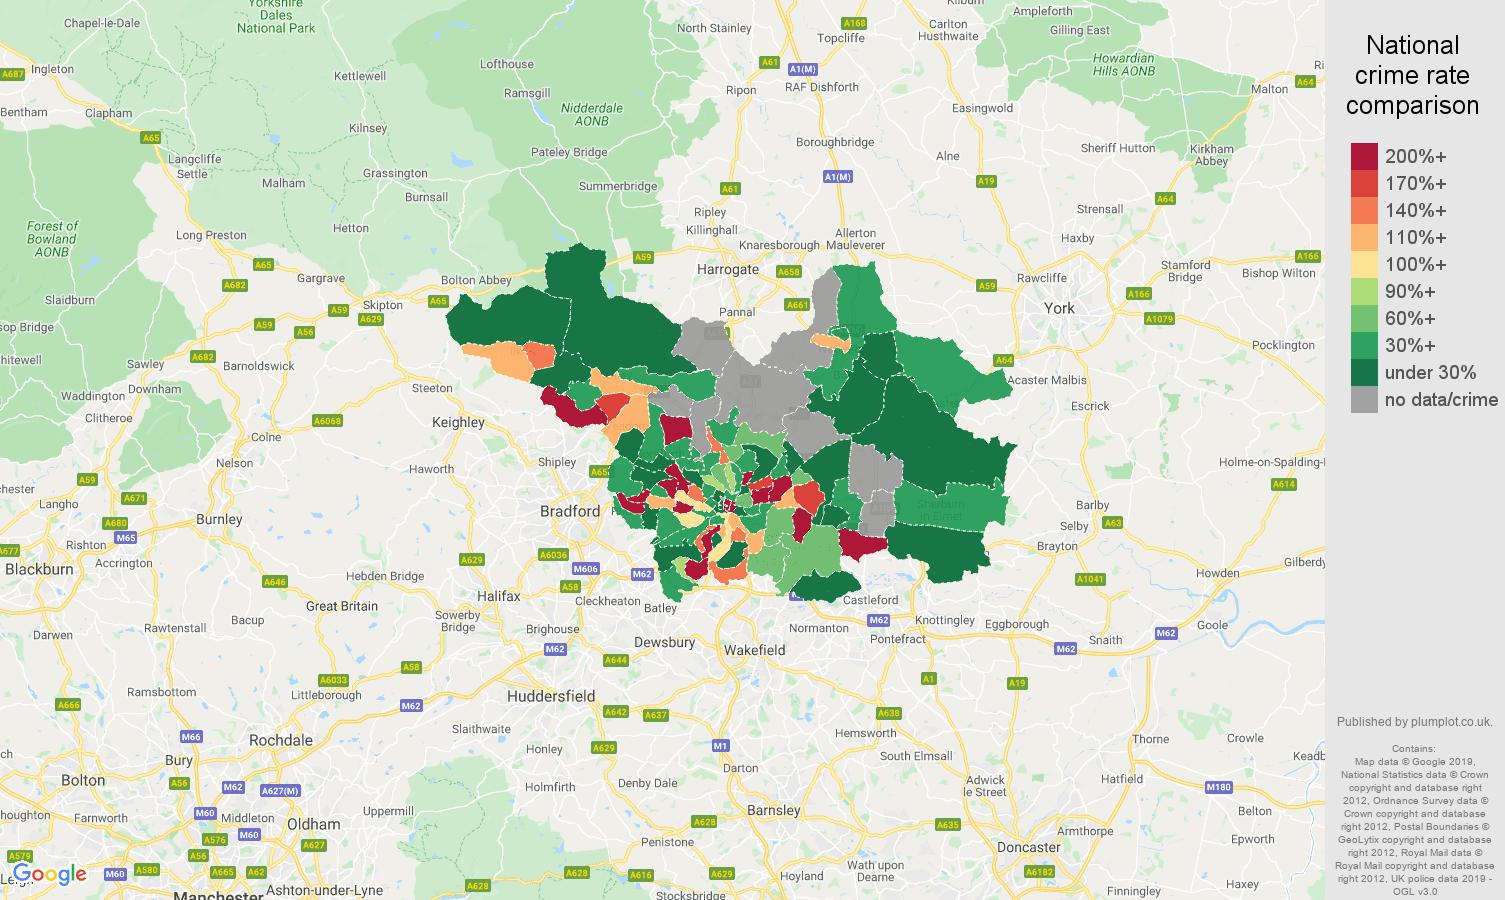 Leeds shoplifting crime rate comparison map